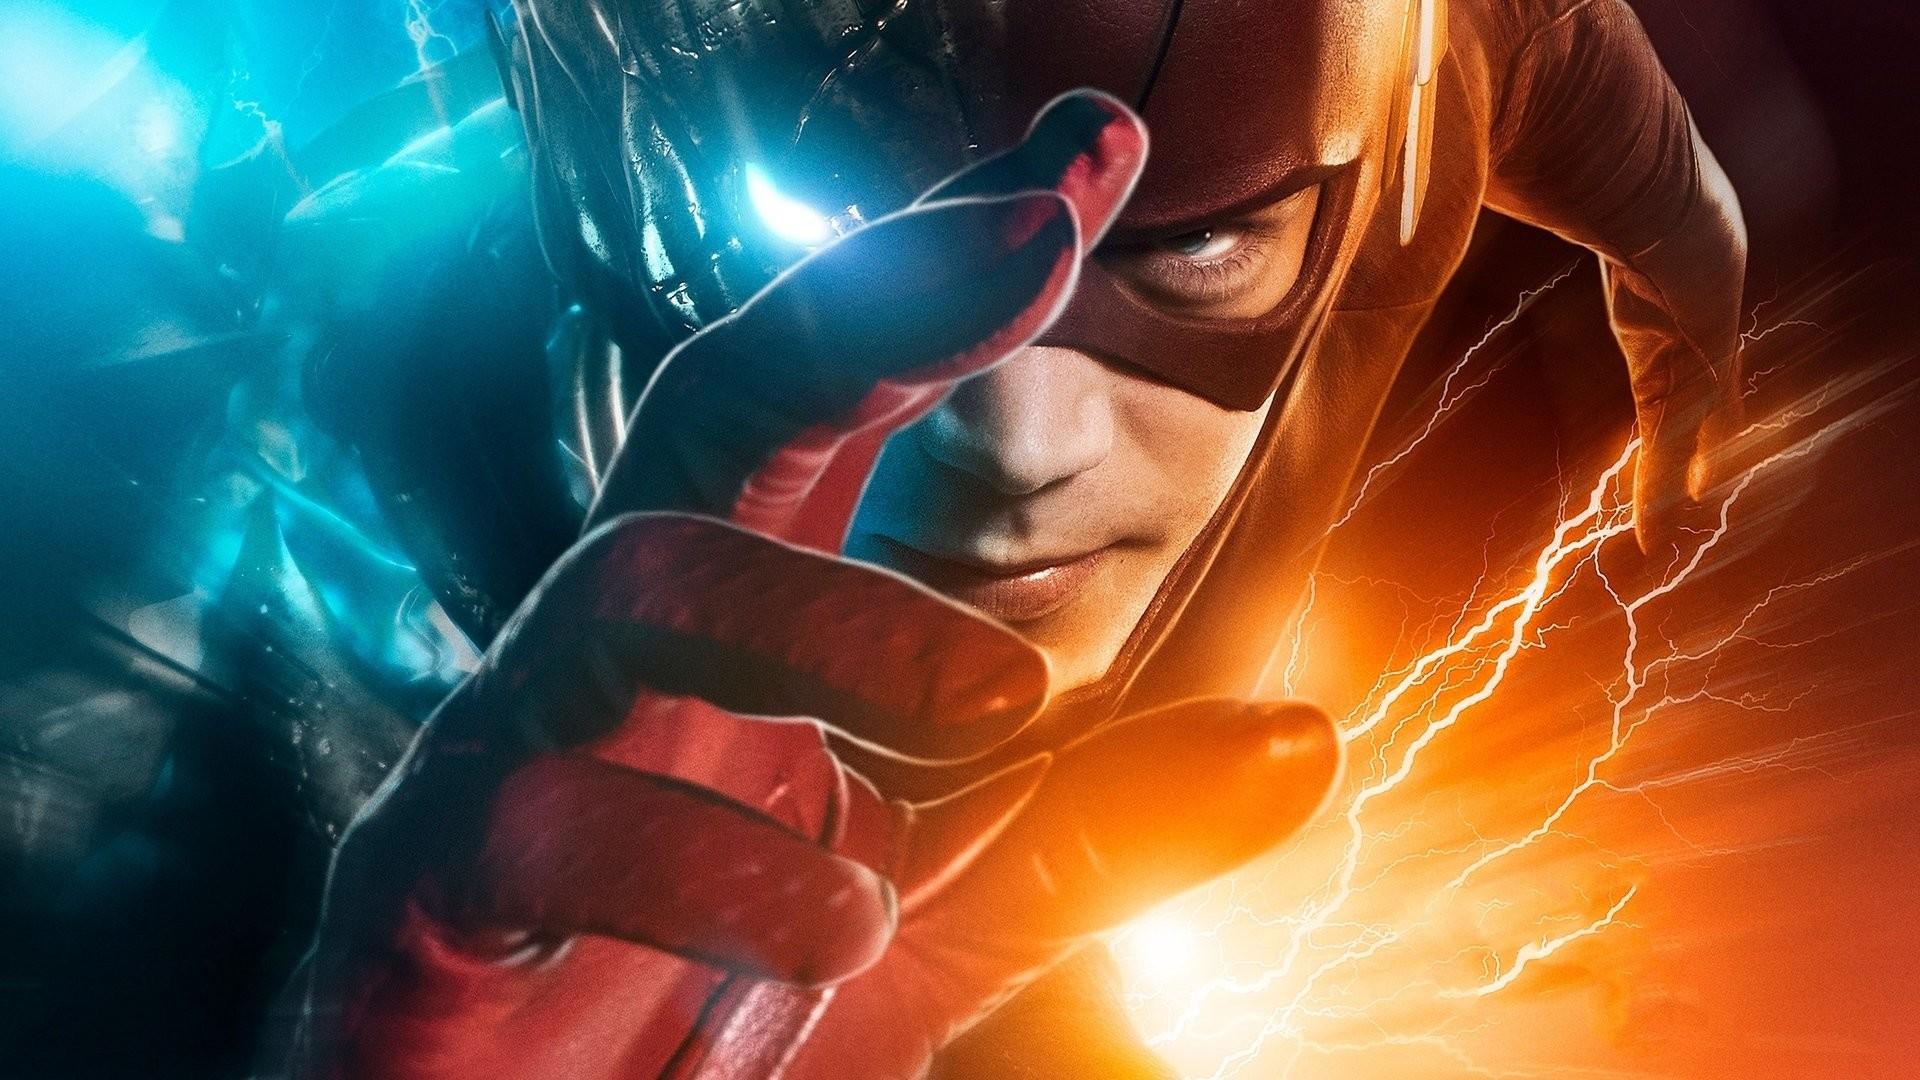 TV Show – The Flash (2014) Flash Grant Gustin Barry Allen Wallpaper